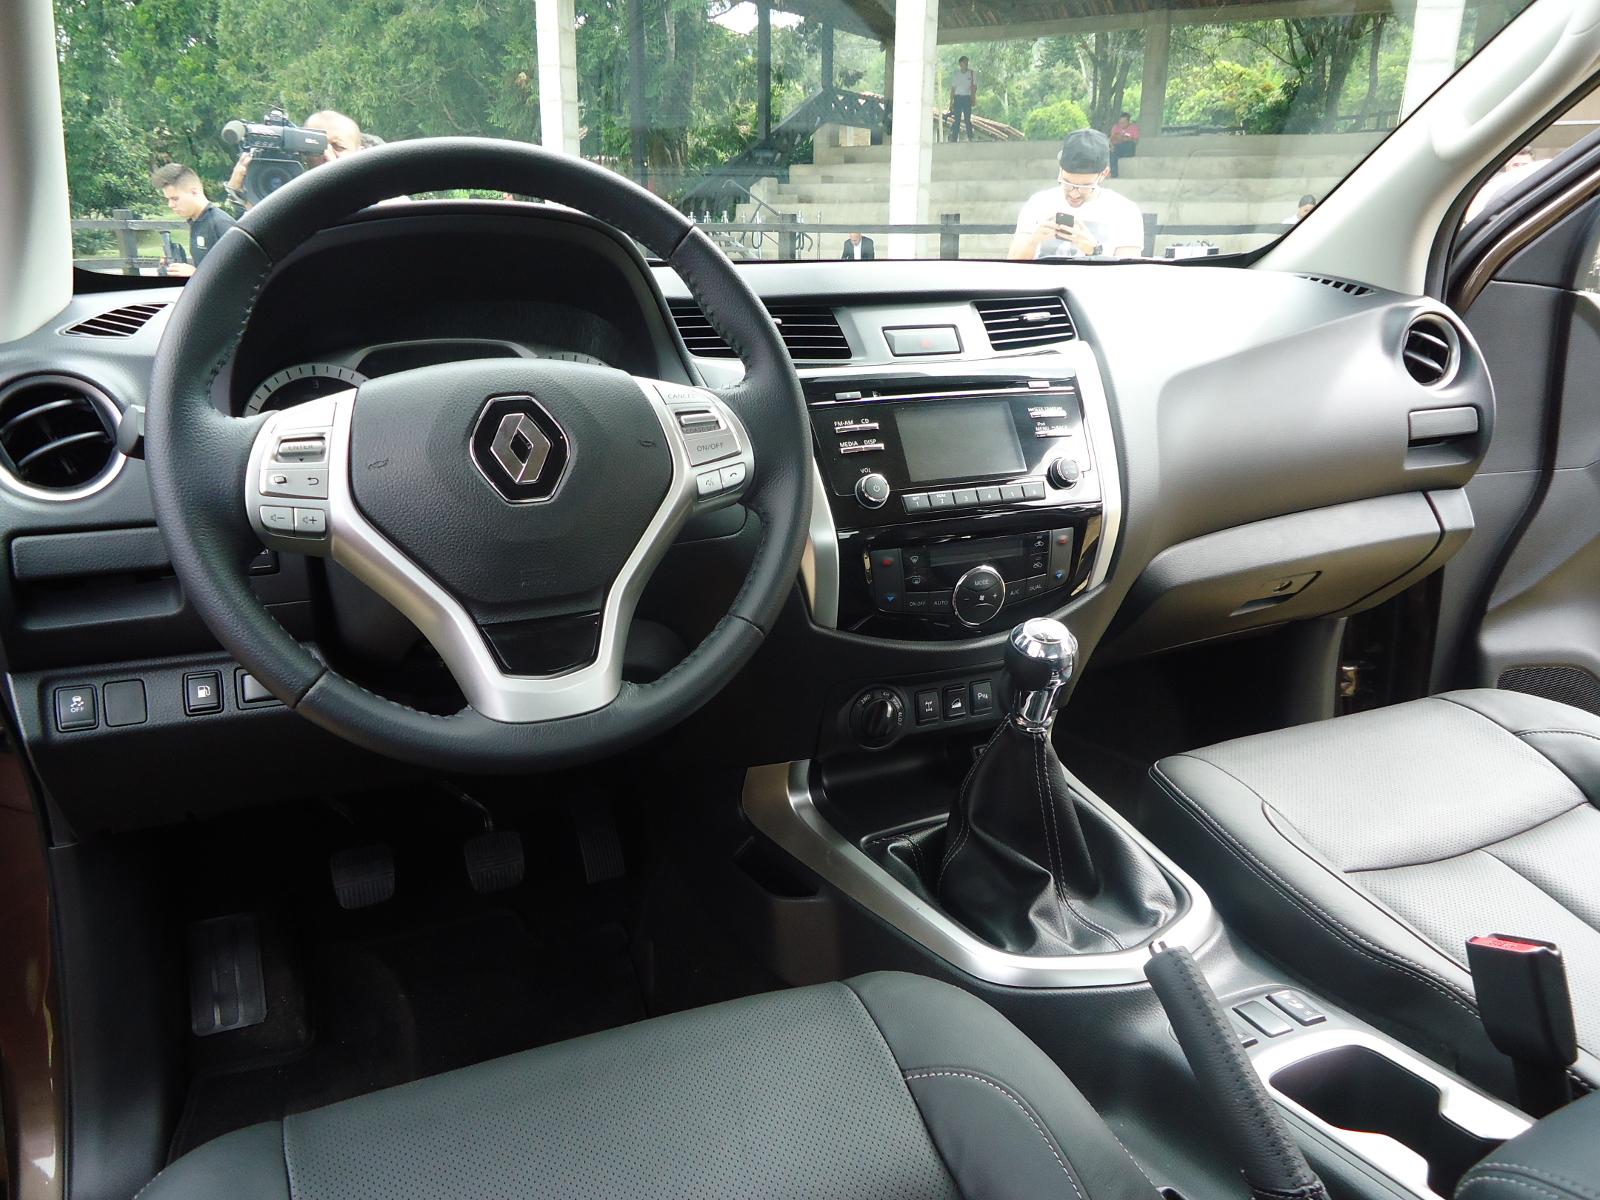 Renault Alaskan 2018 >> Renault Alaskan: La experiencia de manejarla | placervial.com